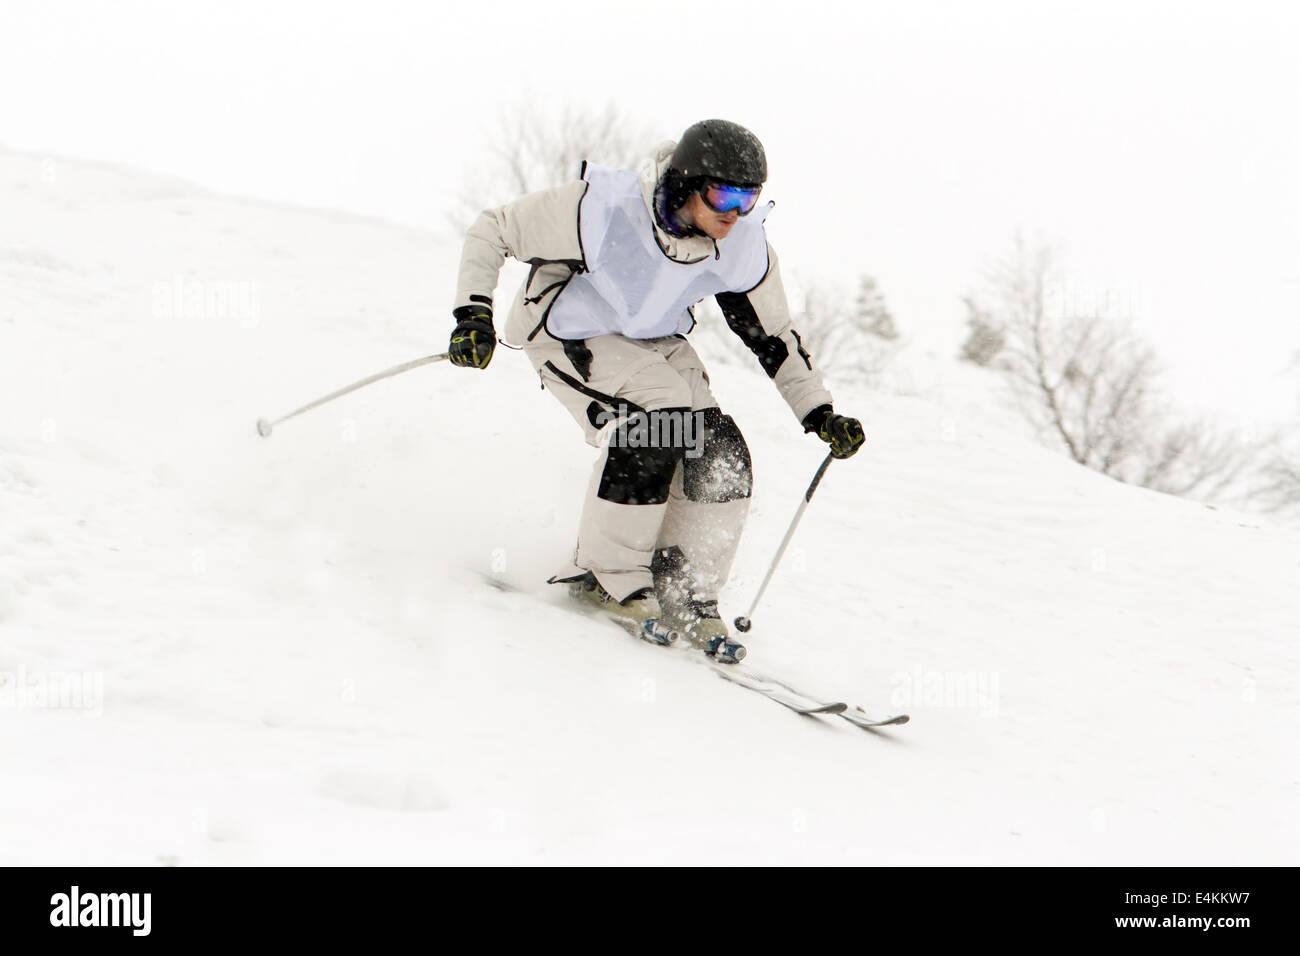 Man skiing - Stock Image